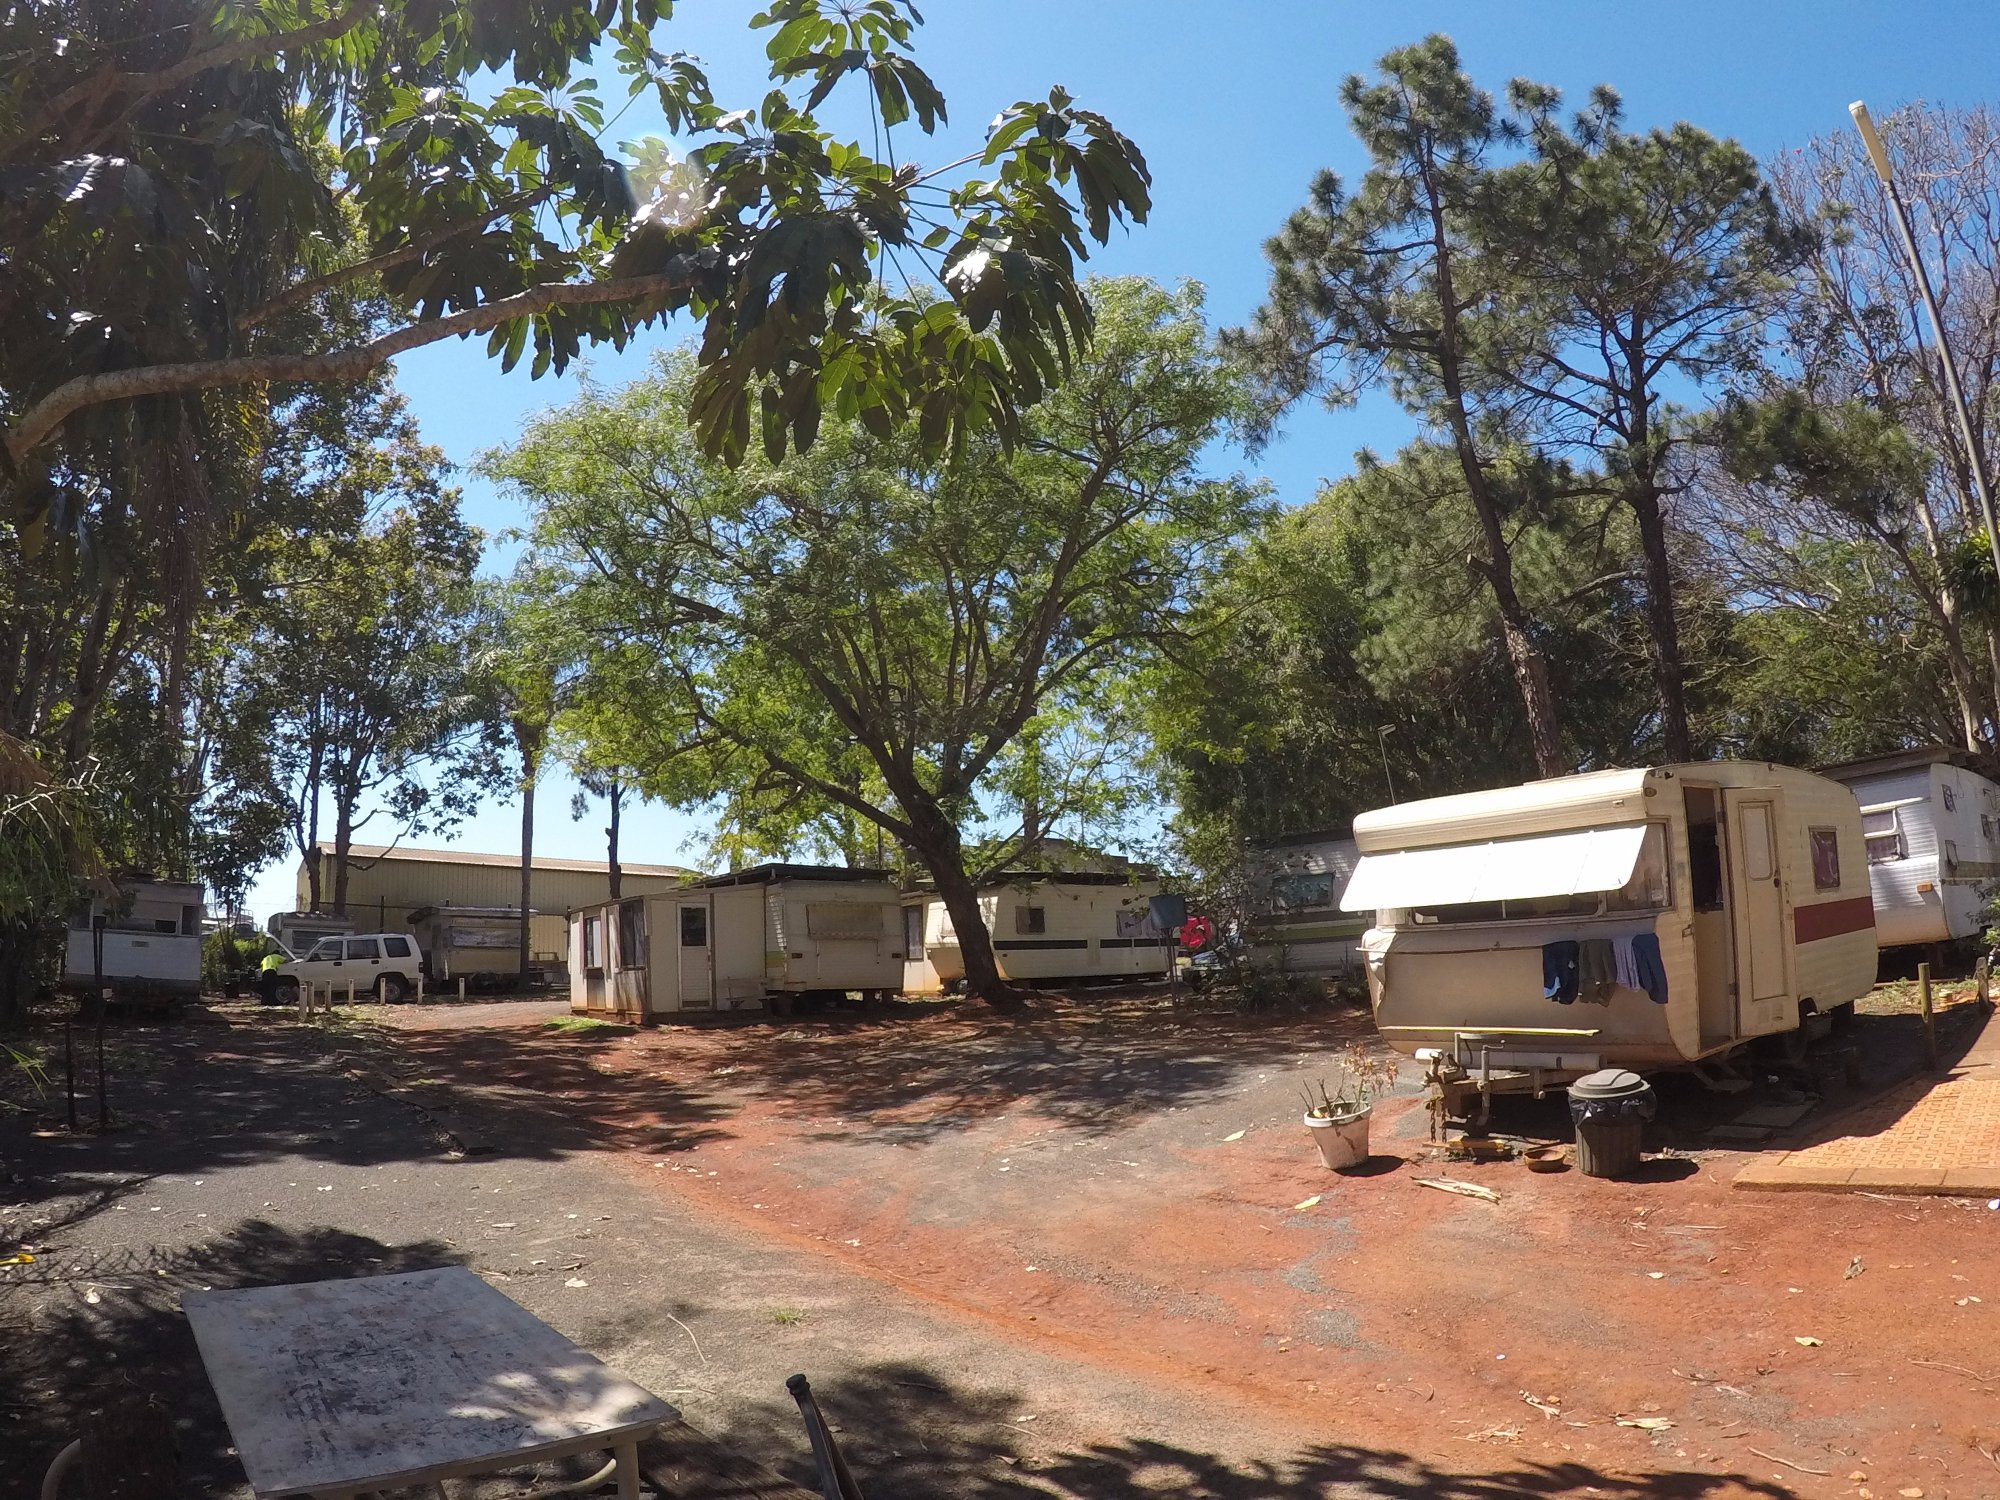 Childers Backpackers Hostel